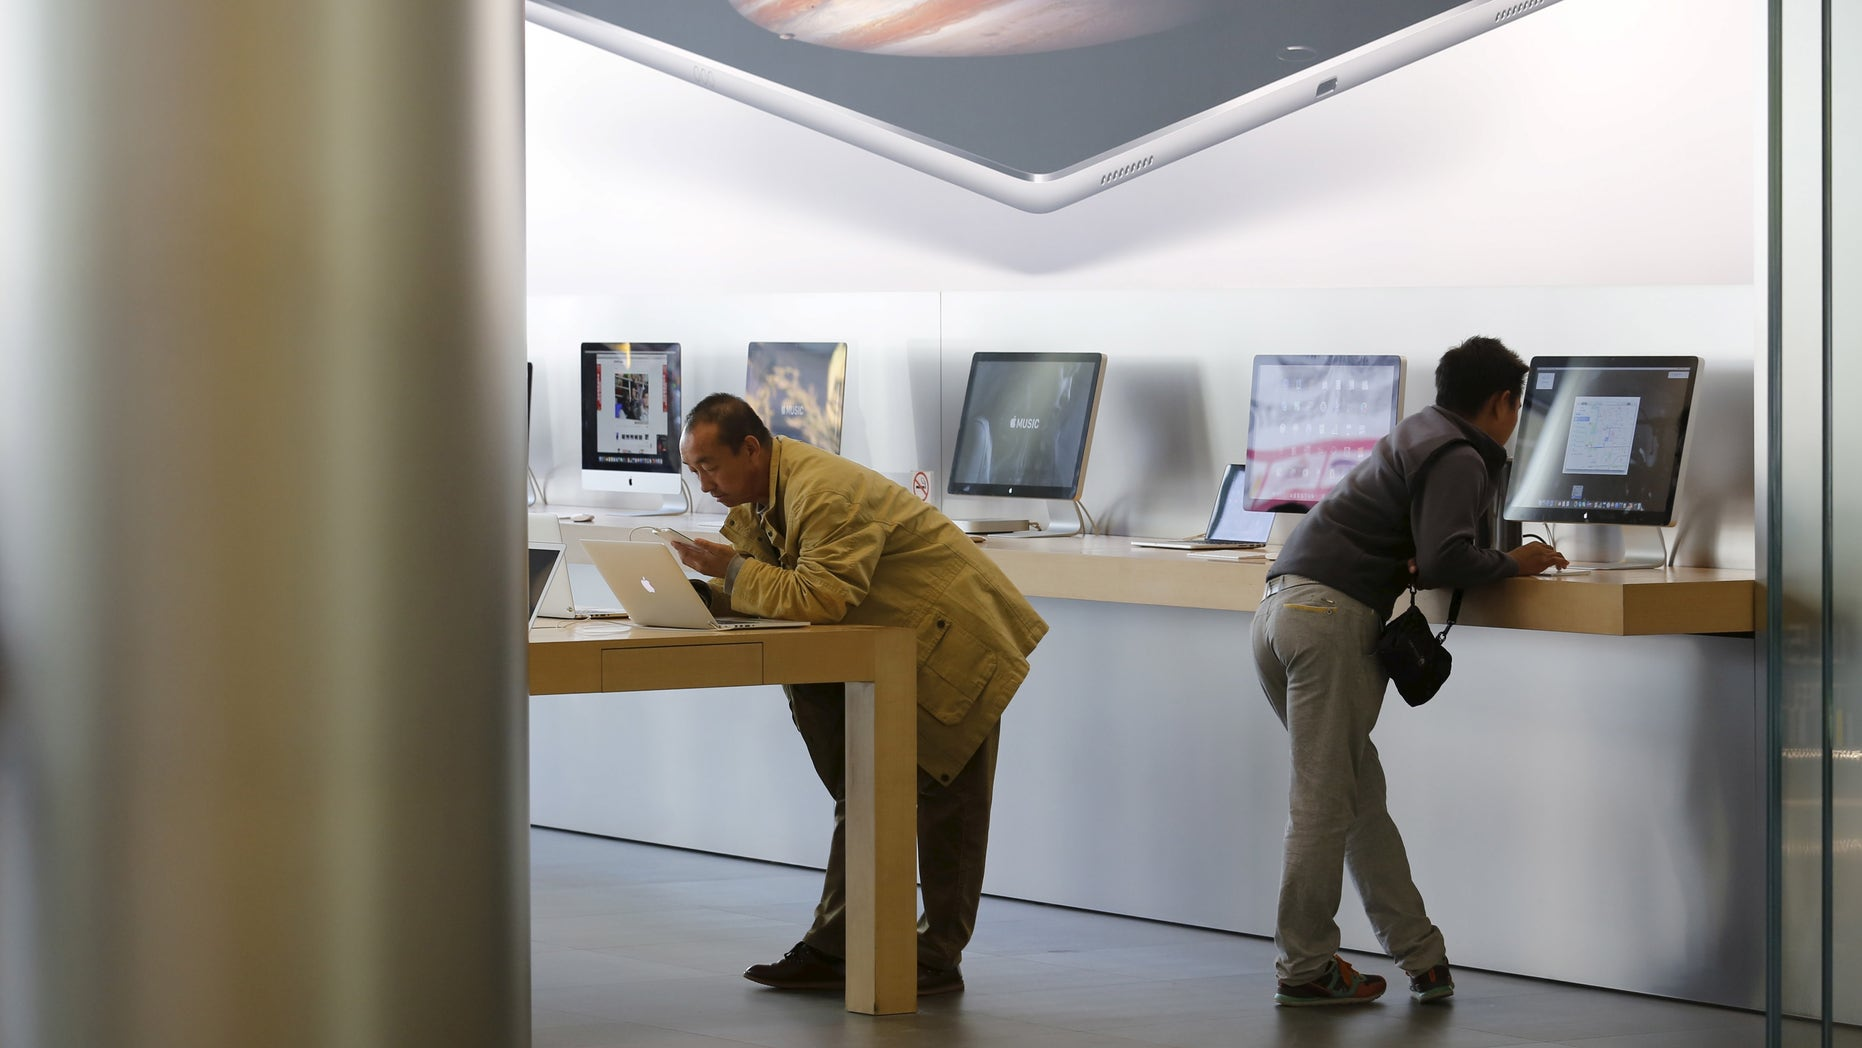 Men try apple's MacBook laptops at an apple store in Beijing. (REUTERS/Kim Kyung-Hoon)